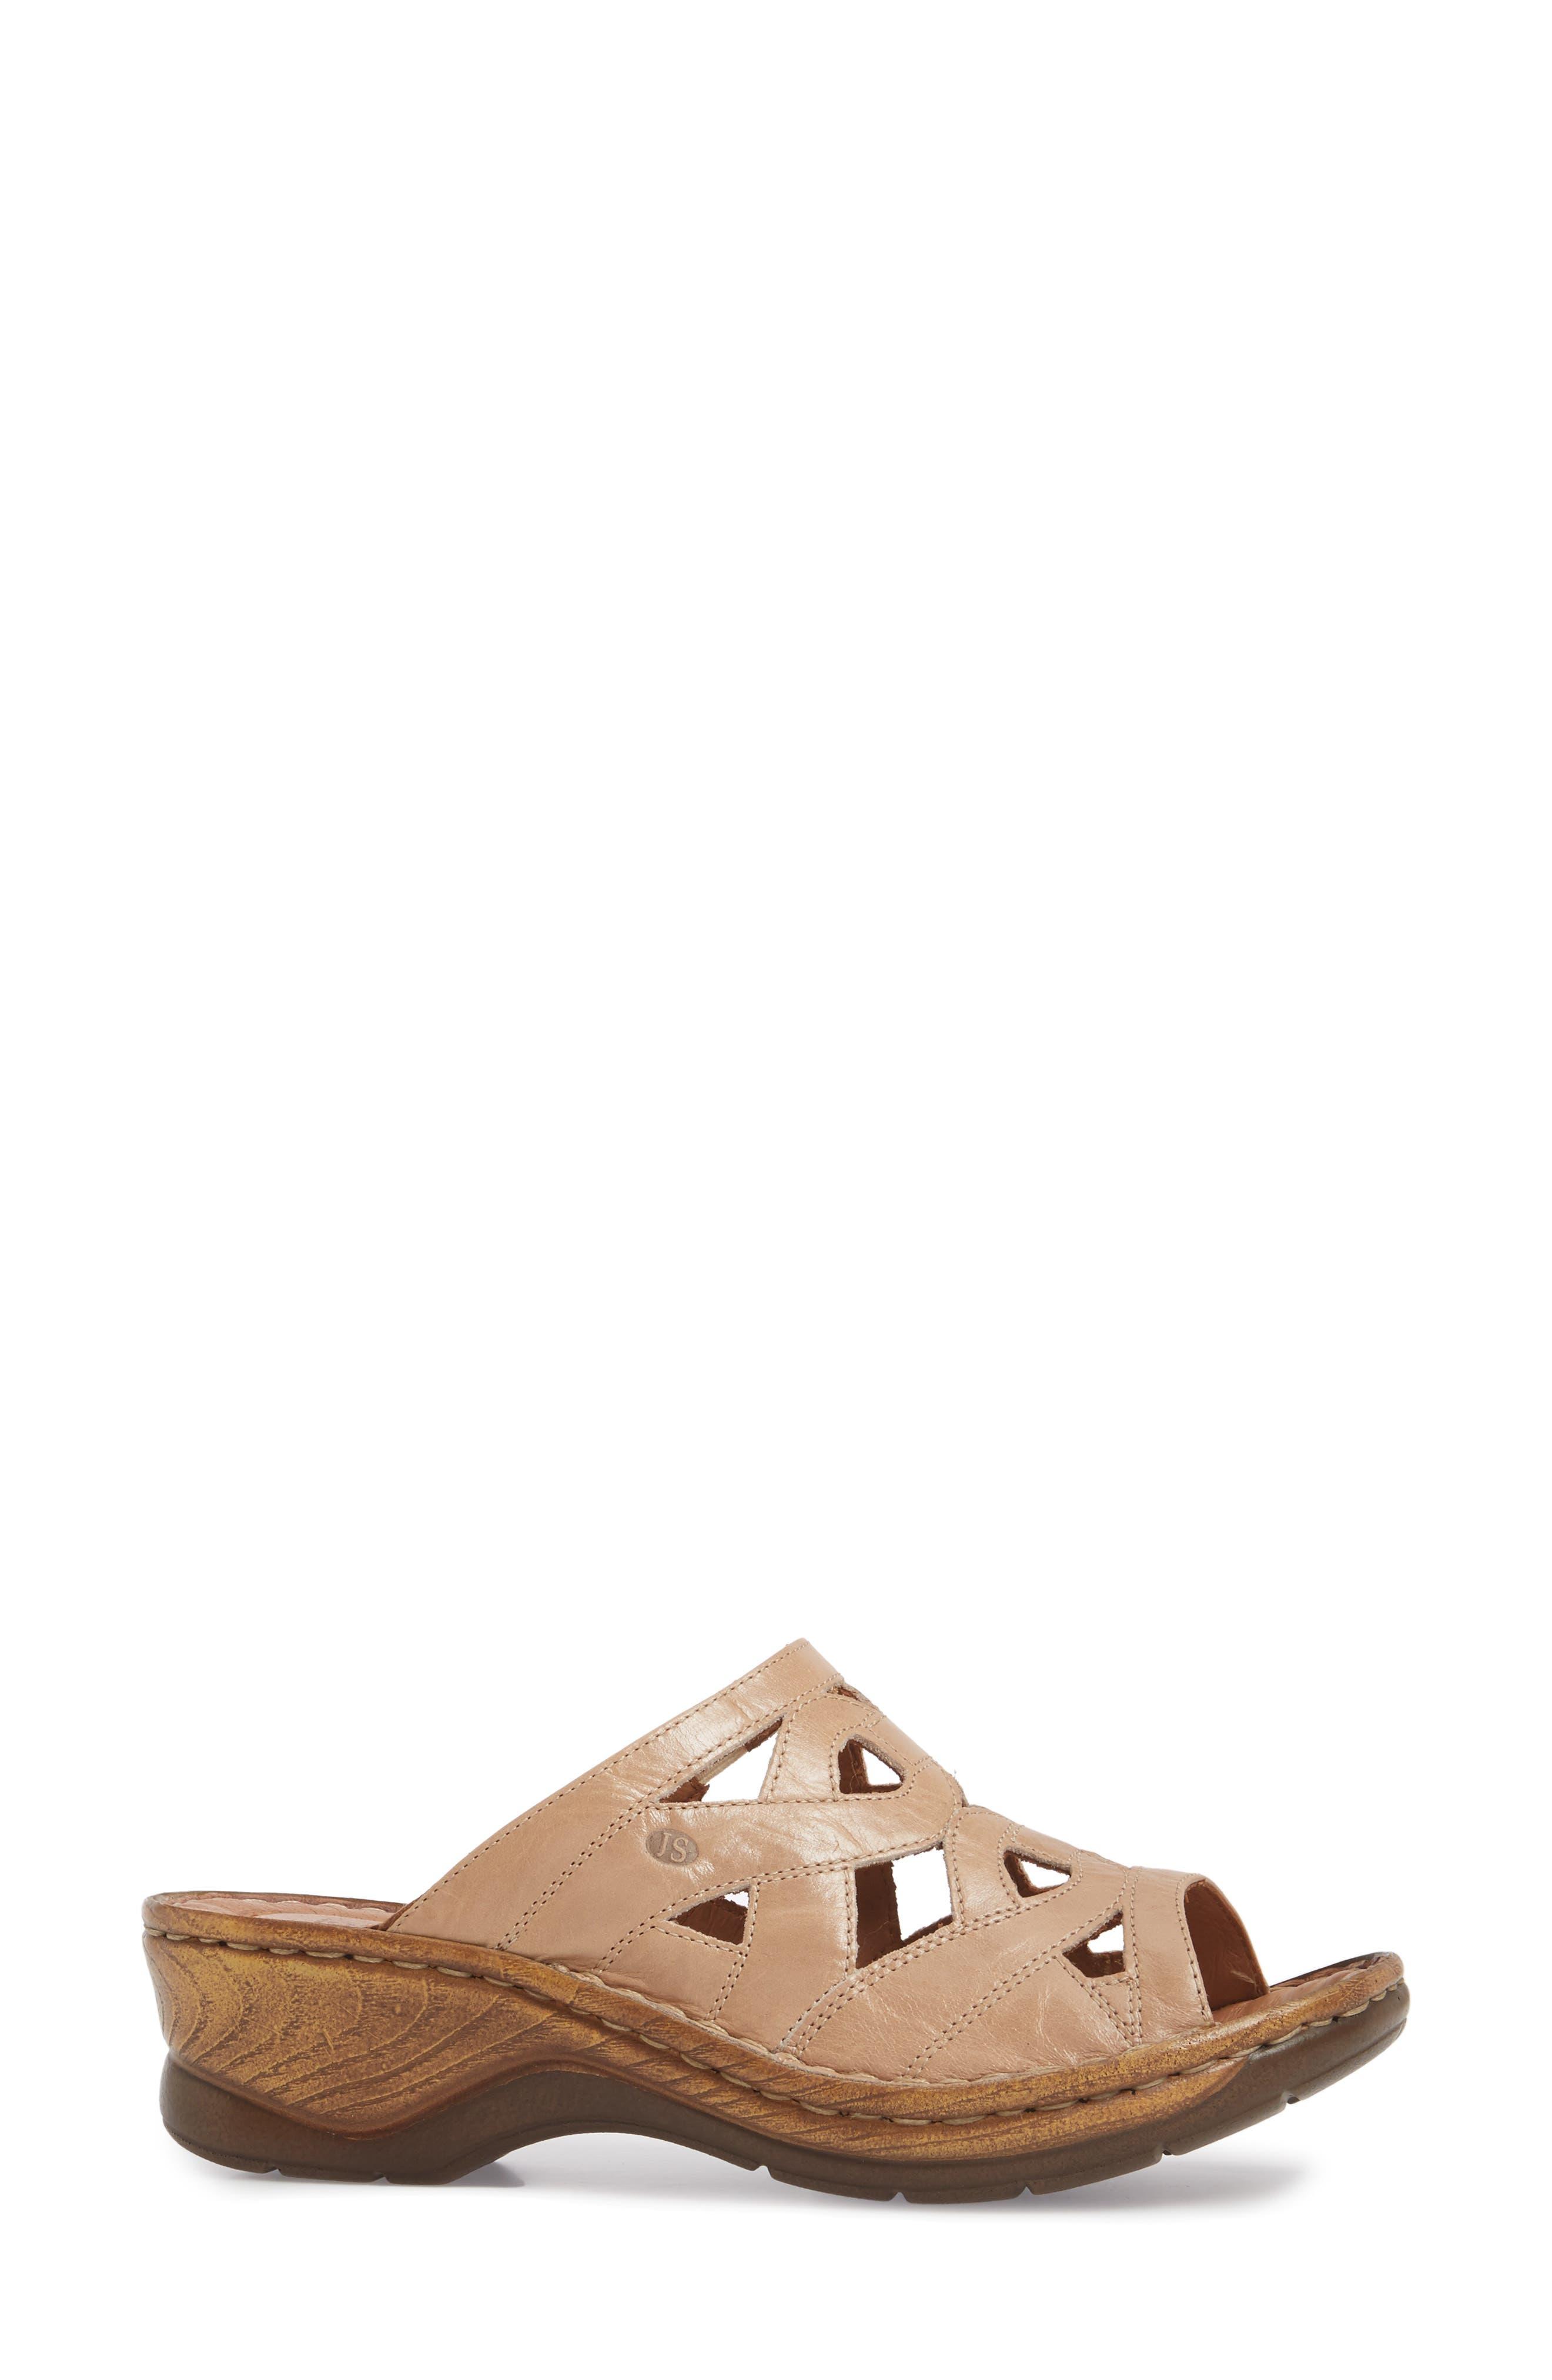 Catalonia 44 Slide Sandal,                             Alternate thumbnail 3, color,                             Beige Leather